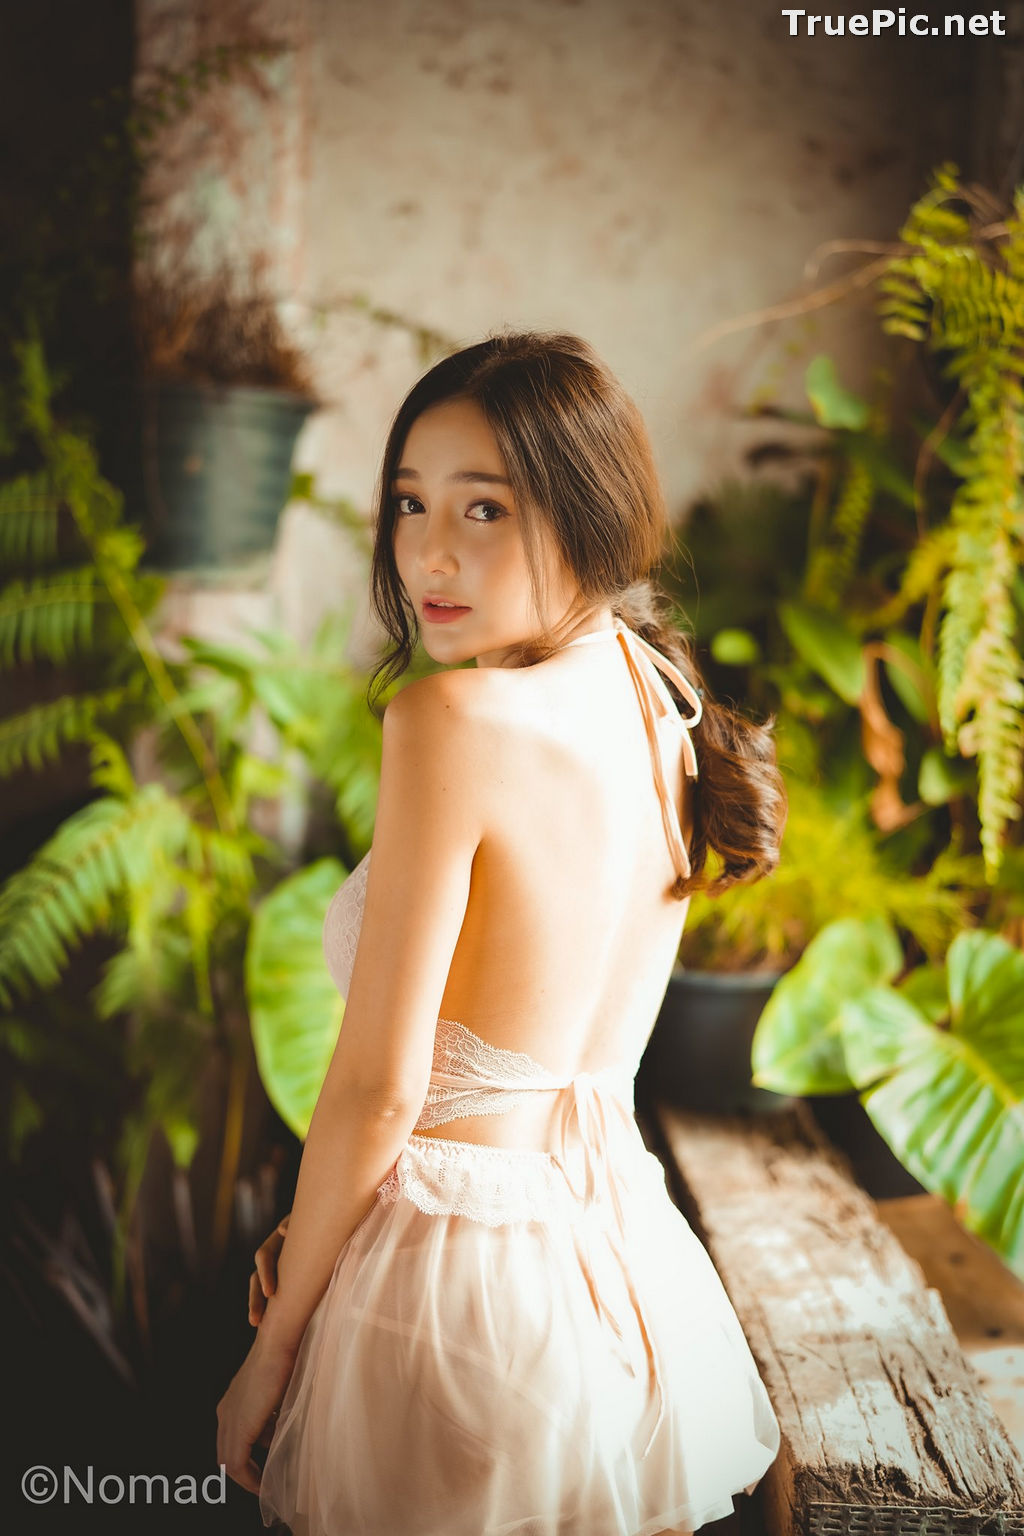 Image Thailand Model - Rossarin Klinhom - Sexy Transparent Dress - TruePic.net - Picture-2